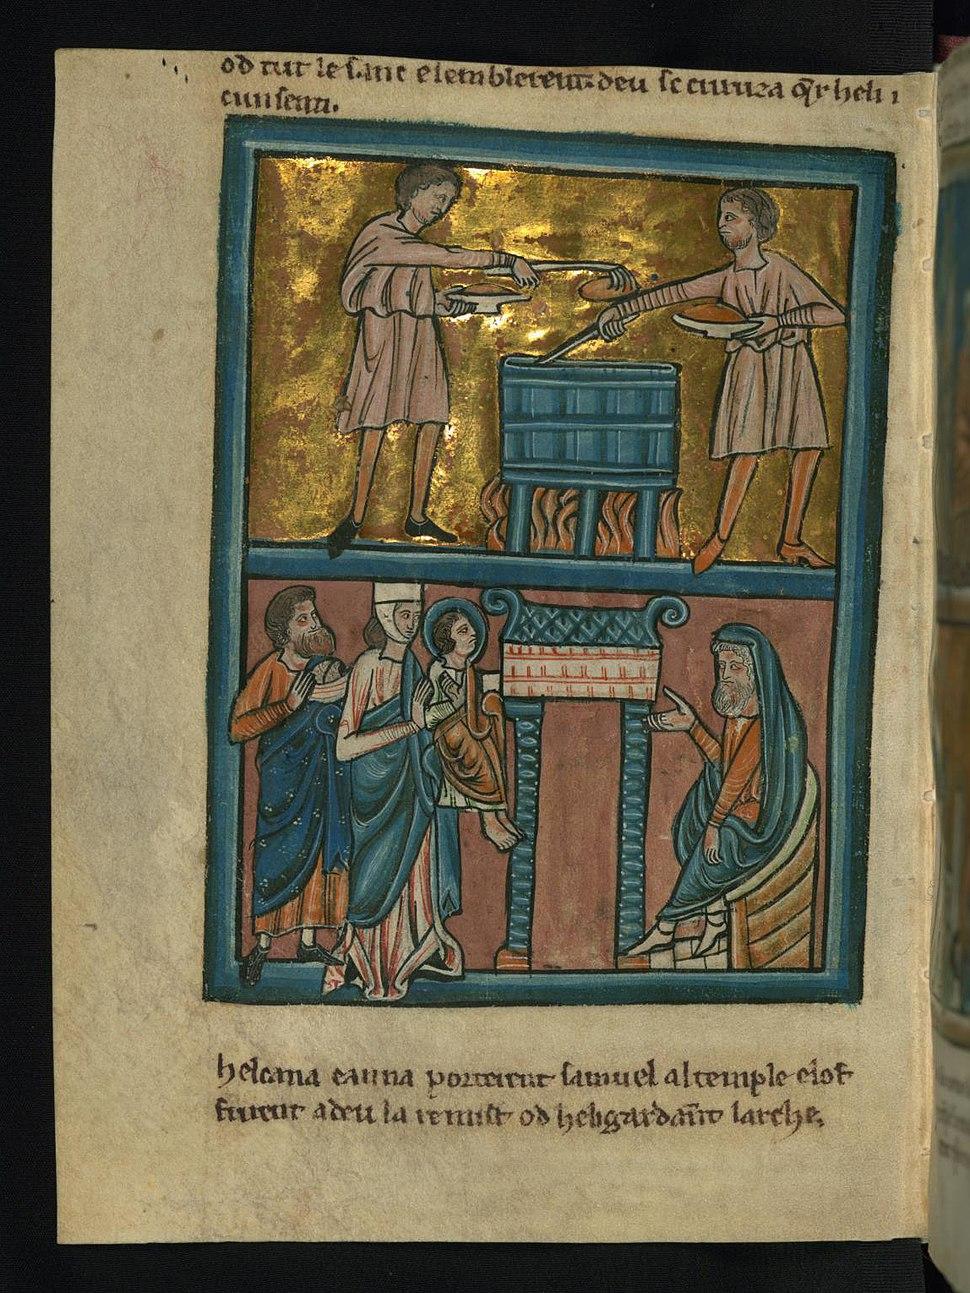 William de Brailes - Top - Eli's Sons Commit Sacrilege (1 Samuel 2 -13-17) - Walters W10617V - Full Page